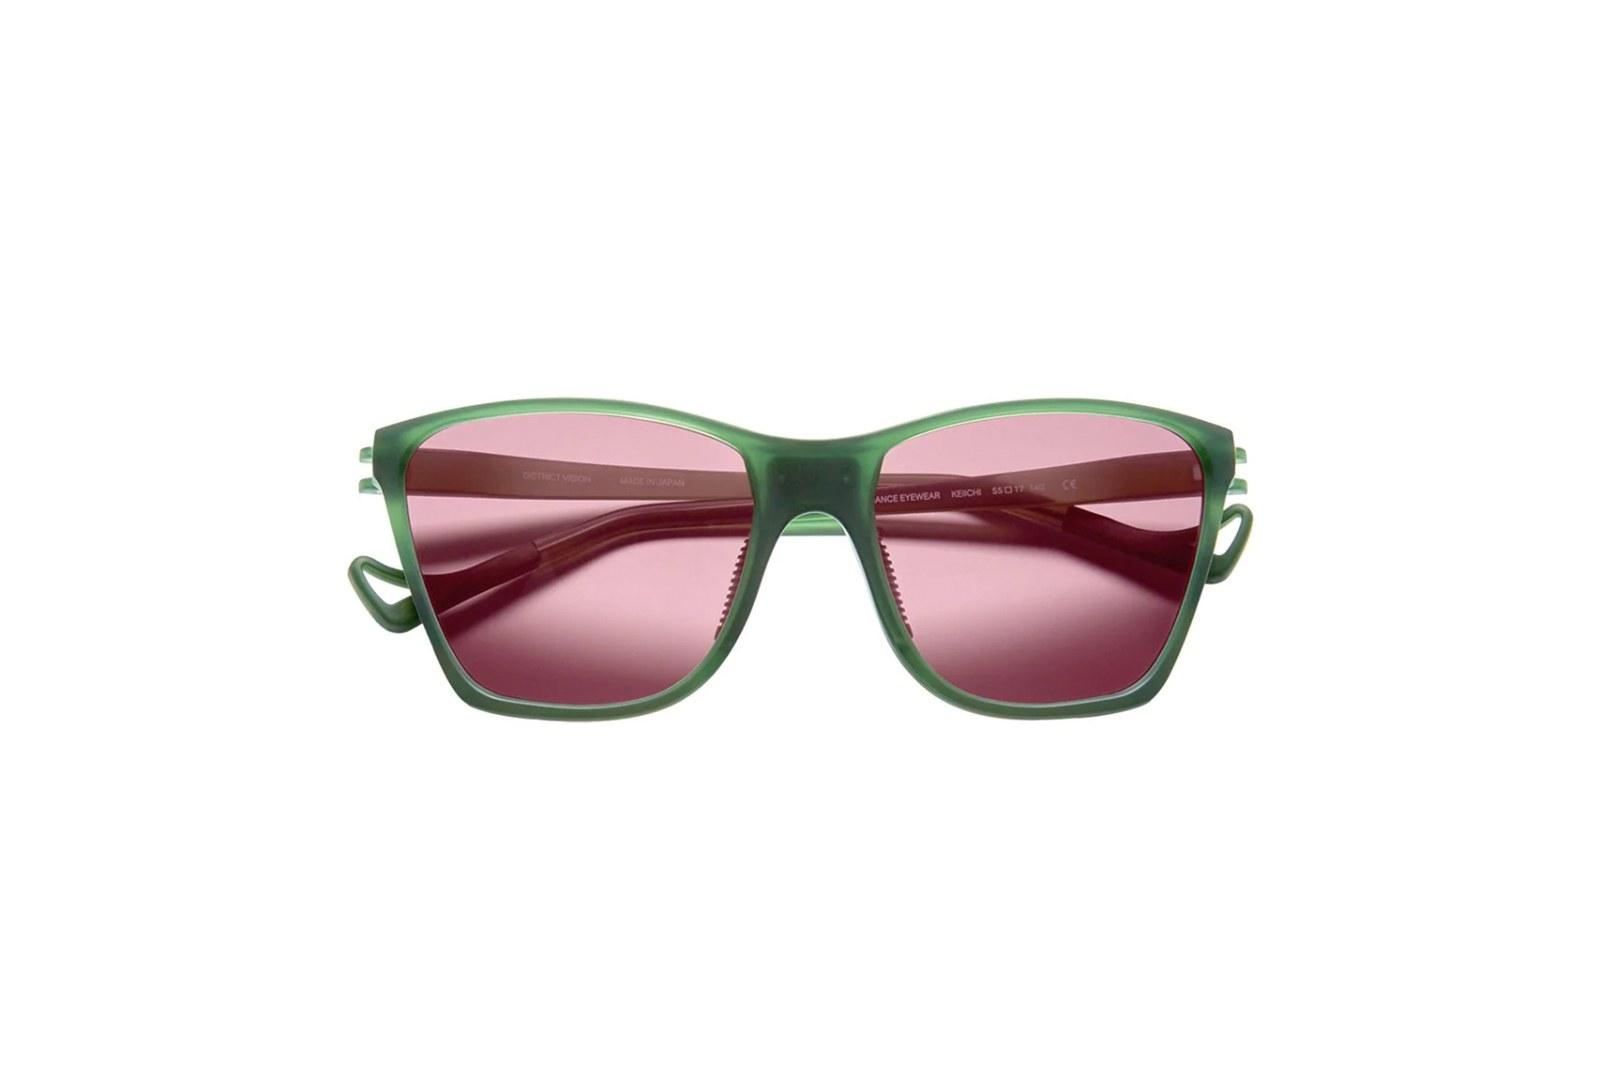 Kính District Vision green Keiichi District Sky G15 sunglasses